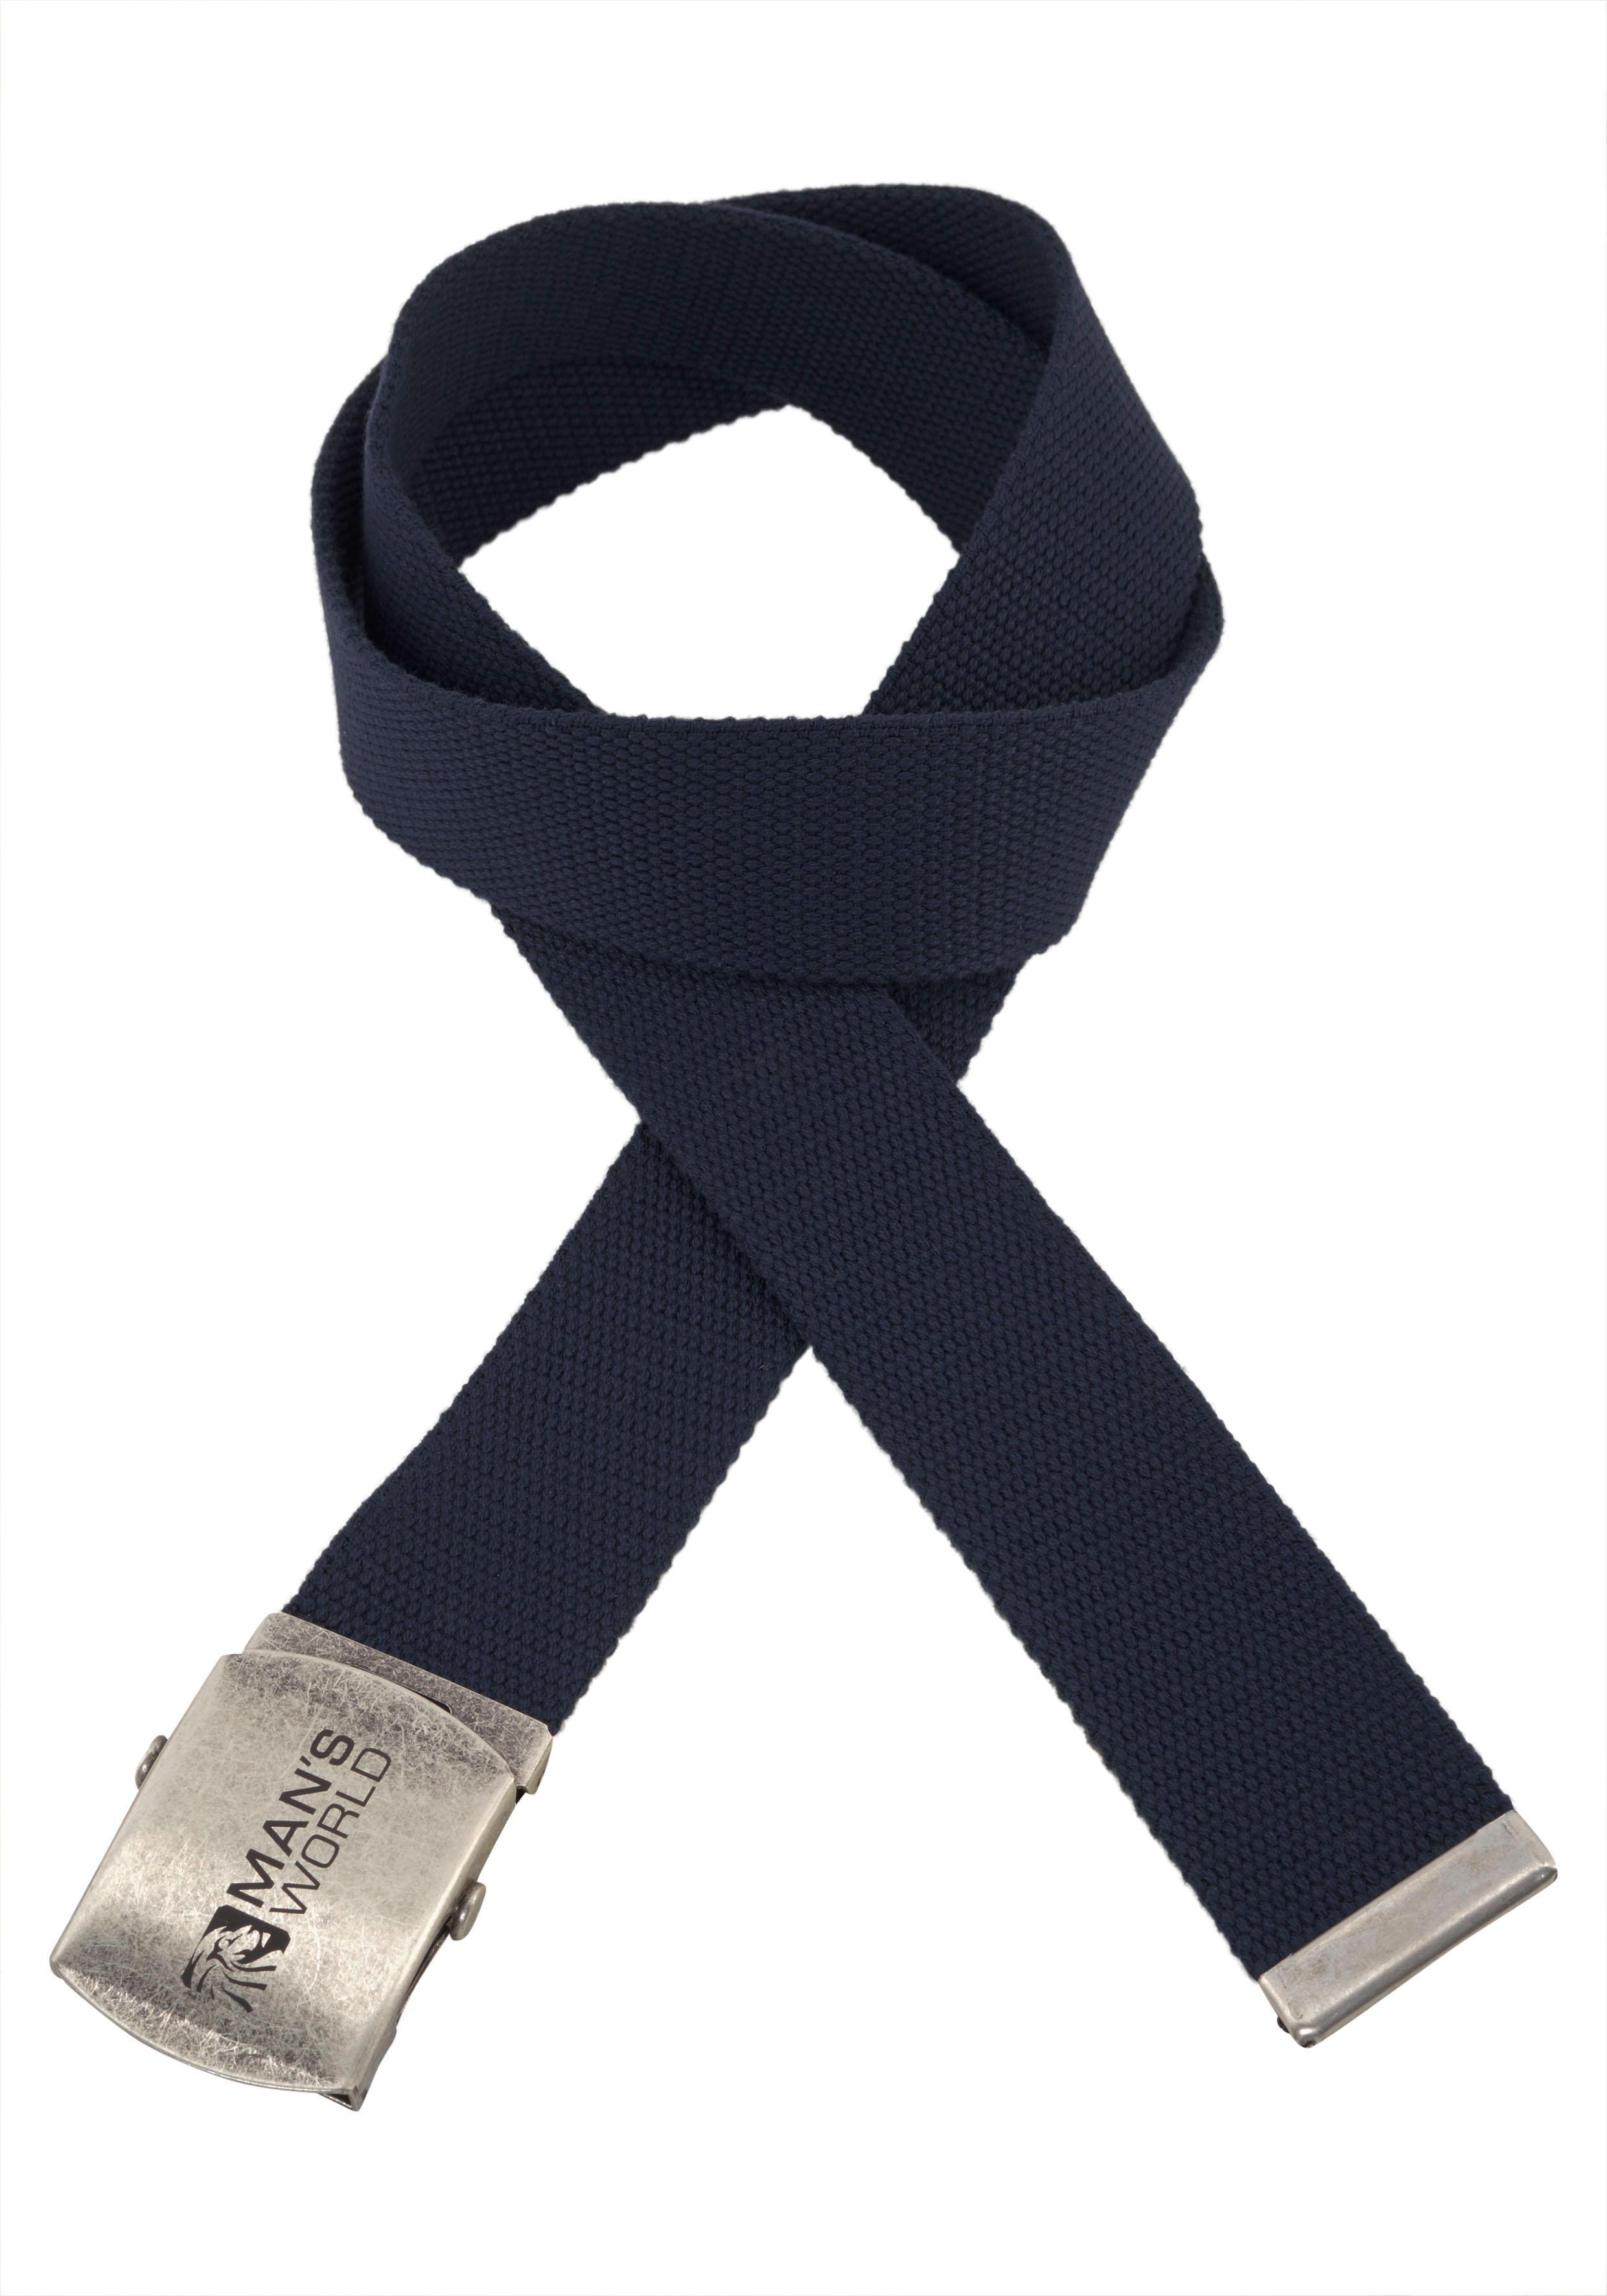 Man's World Stoffgürtel, Mit Koppelschließe, Textilbandgürtel blau Damen Koppelgürtel Gürtel Accessoires Stoffgürtel